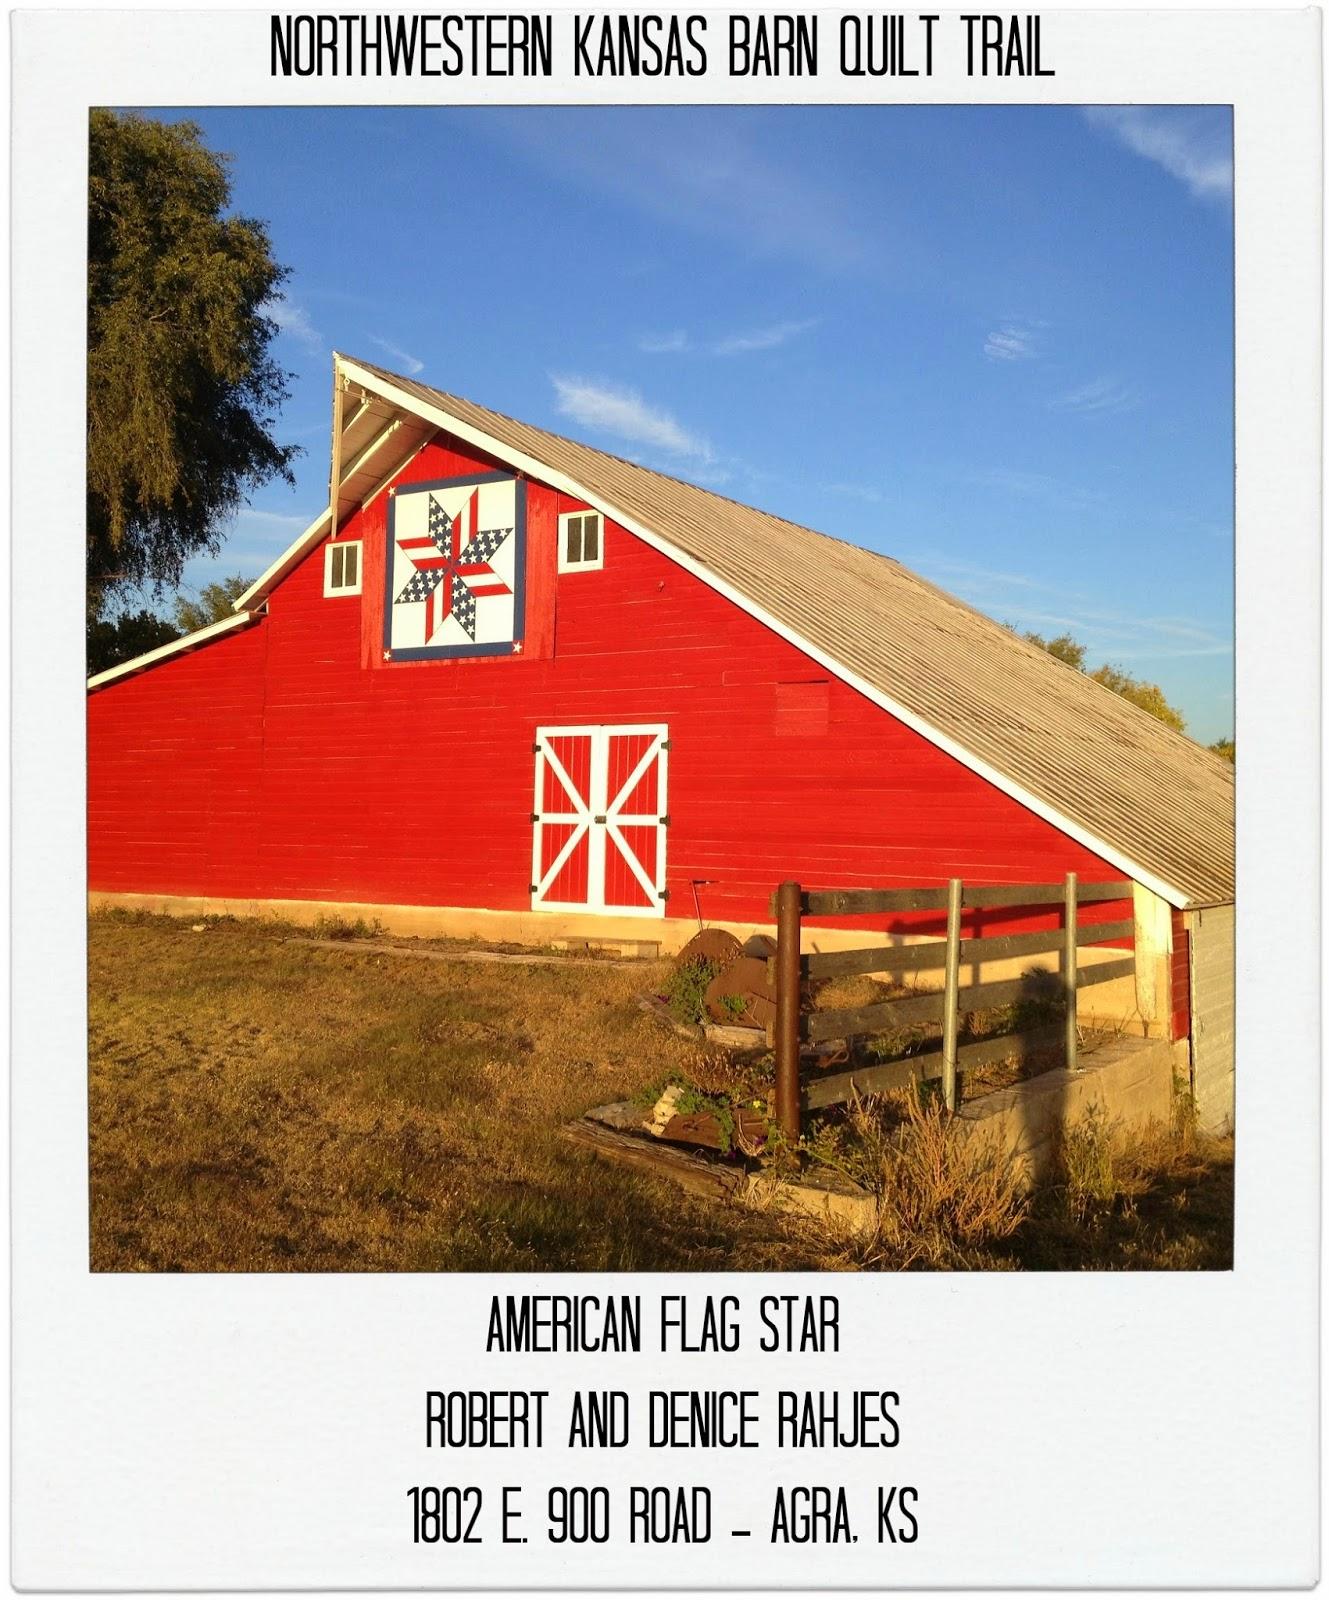 Kansas phillips county kirwin - Kensington In Phillips County Kirwin